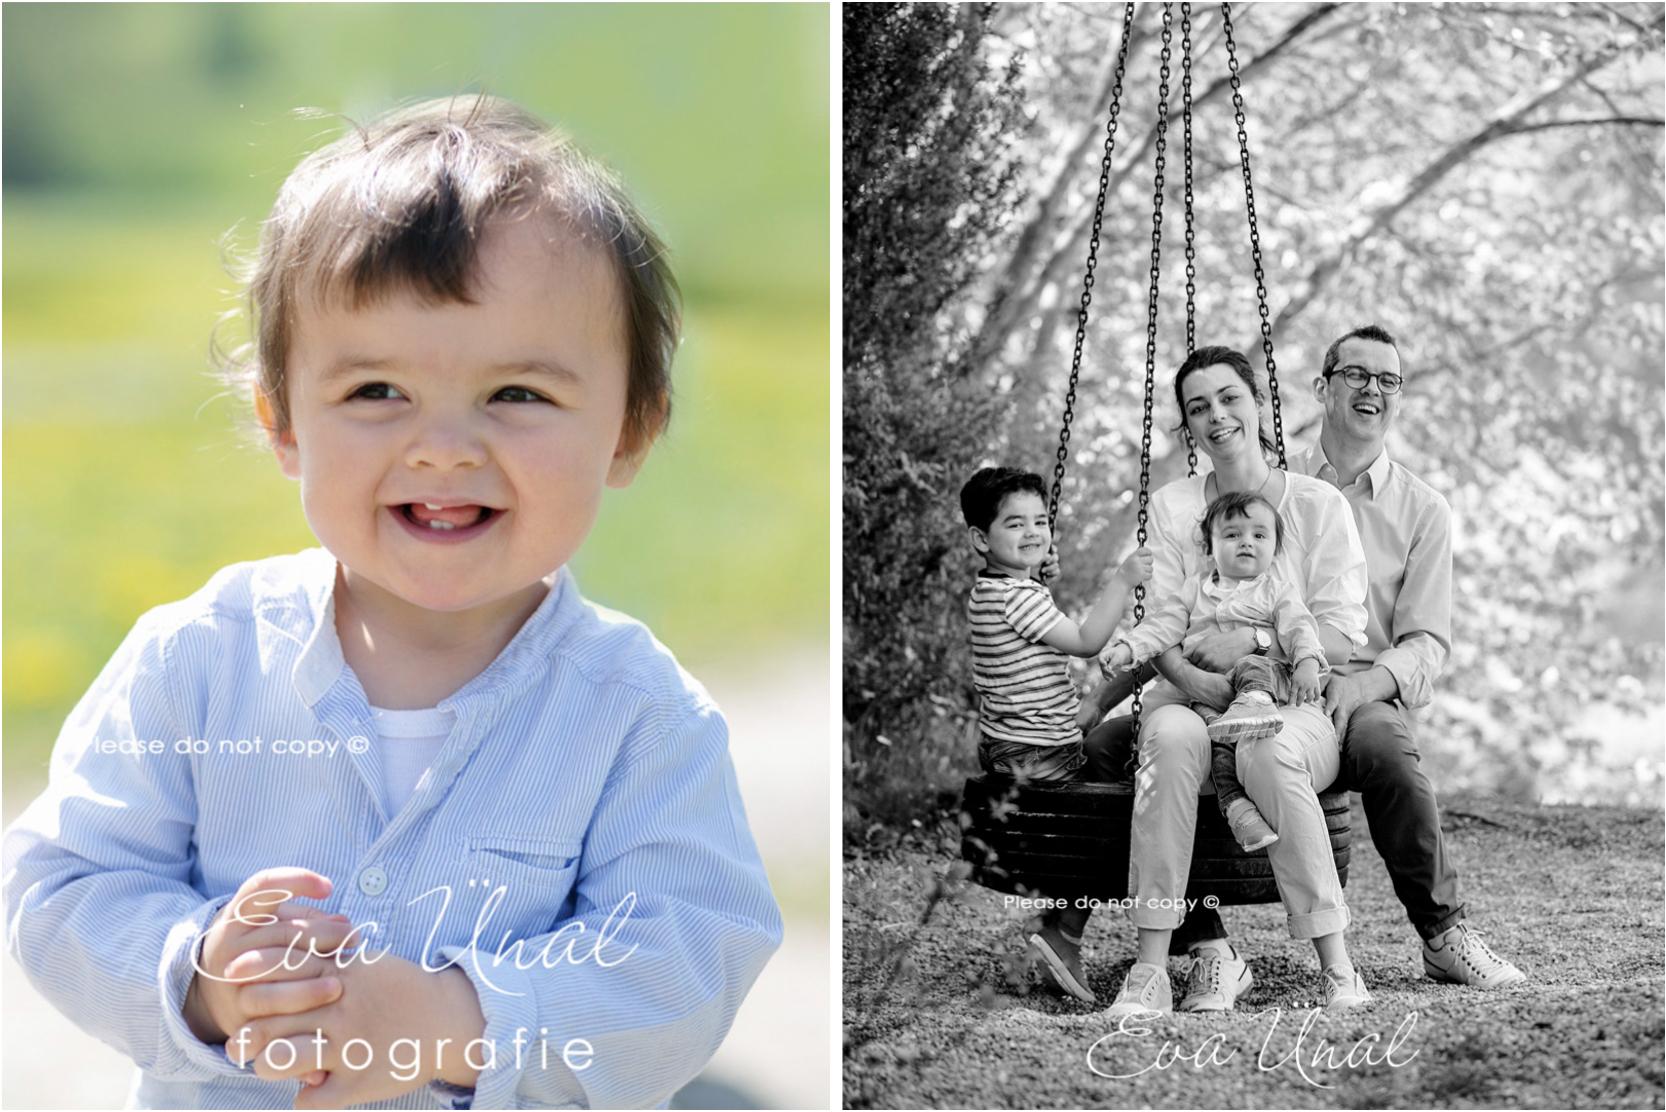 Mai Familienfotografie Outdoor-09.jpg